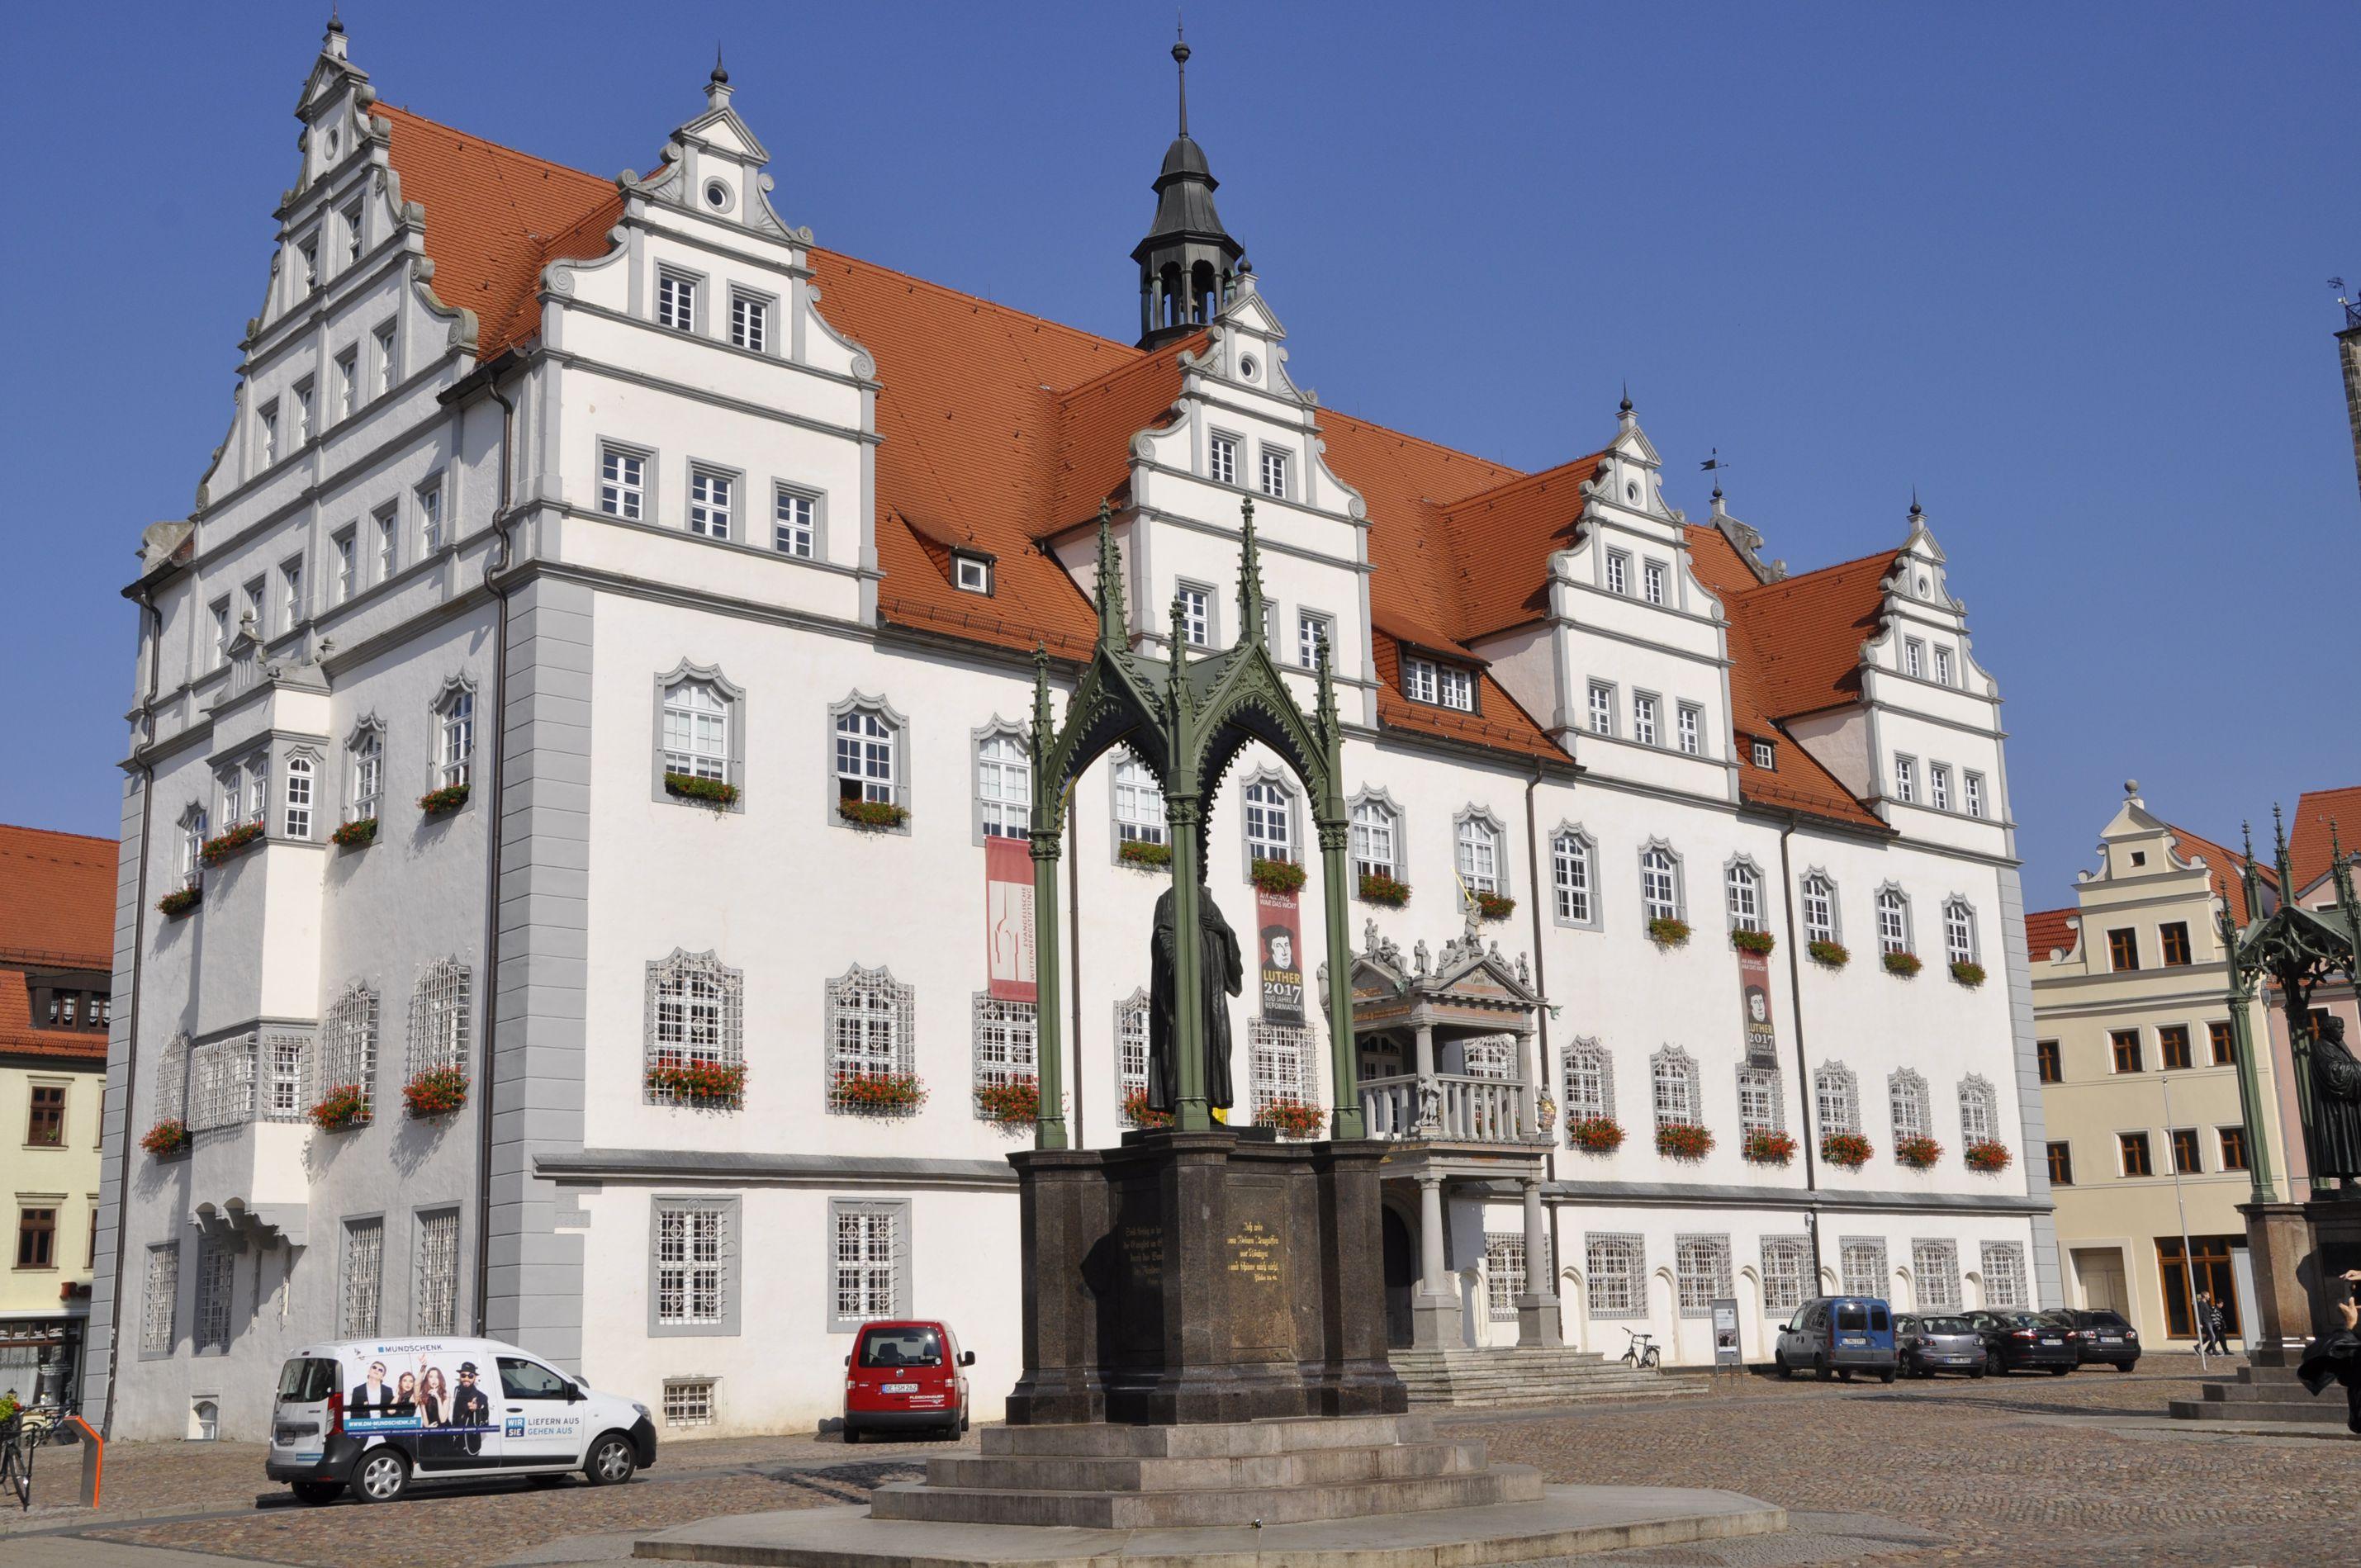 Marktplatz Wittenberg.jpg